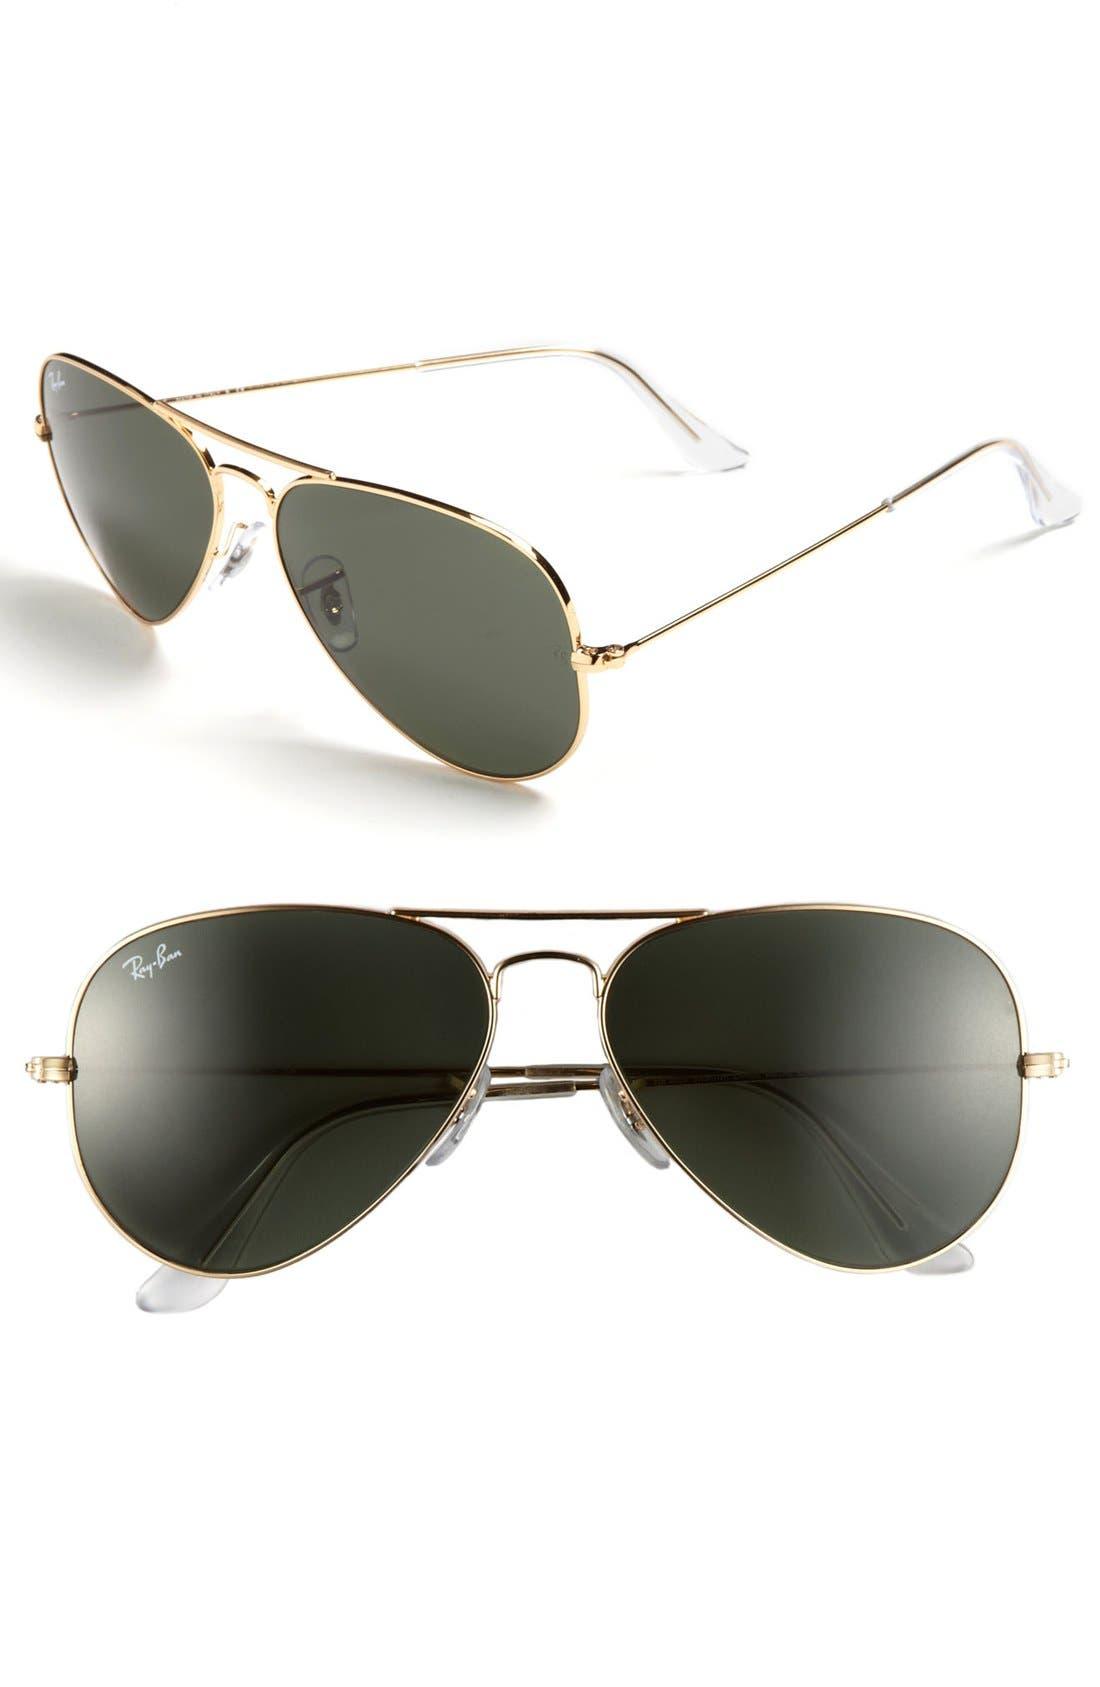 Ray-Ban Standard Original 5m Aviator Sunglasses - Gold